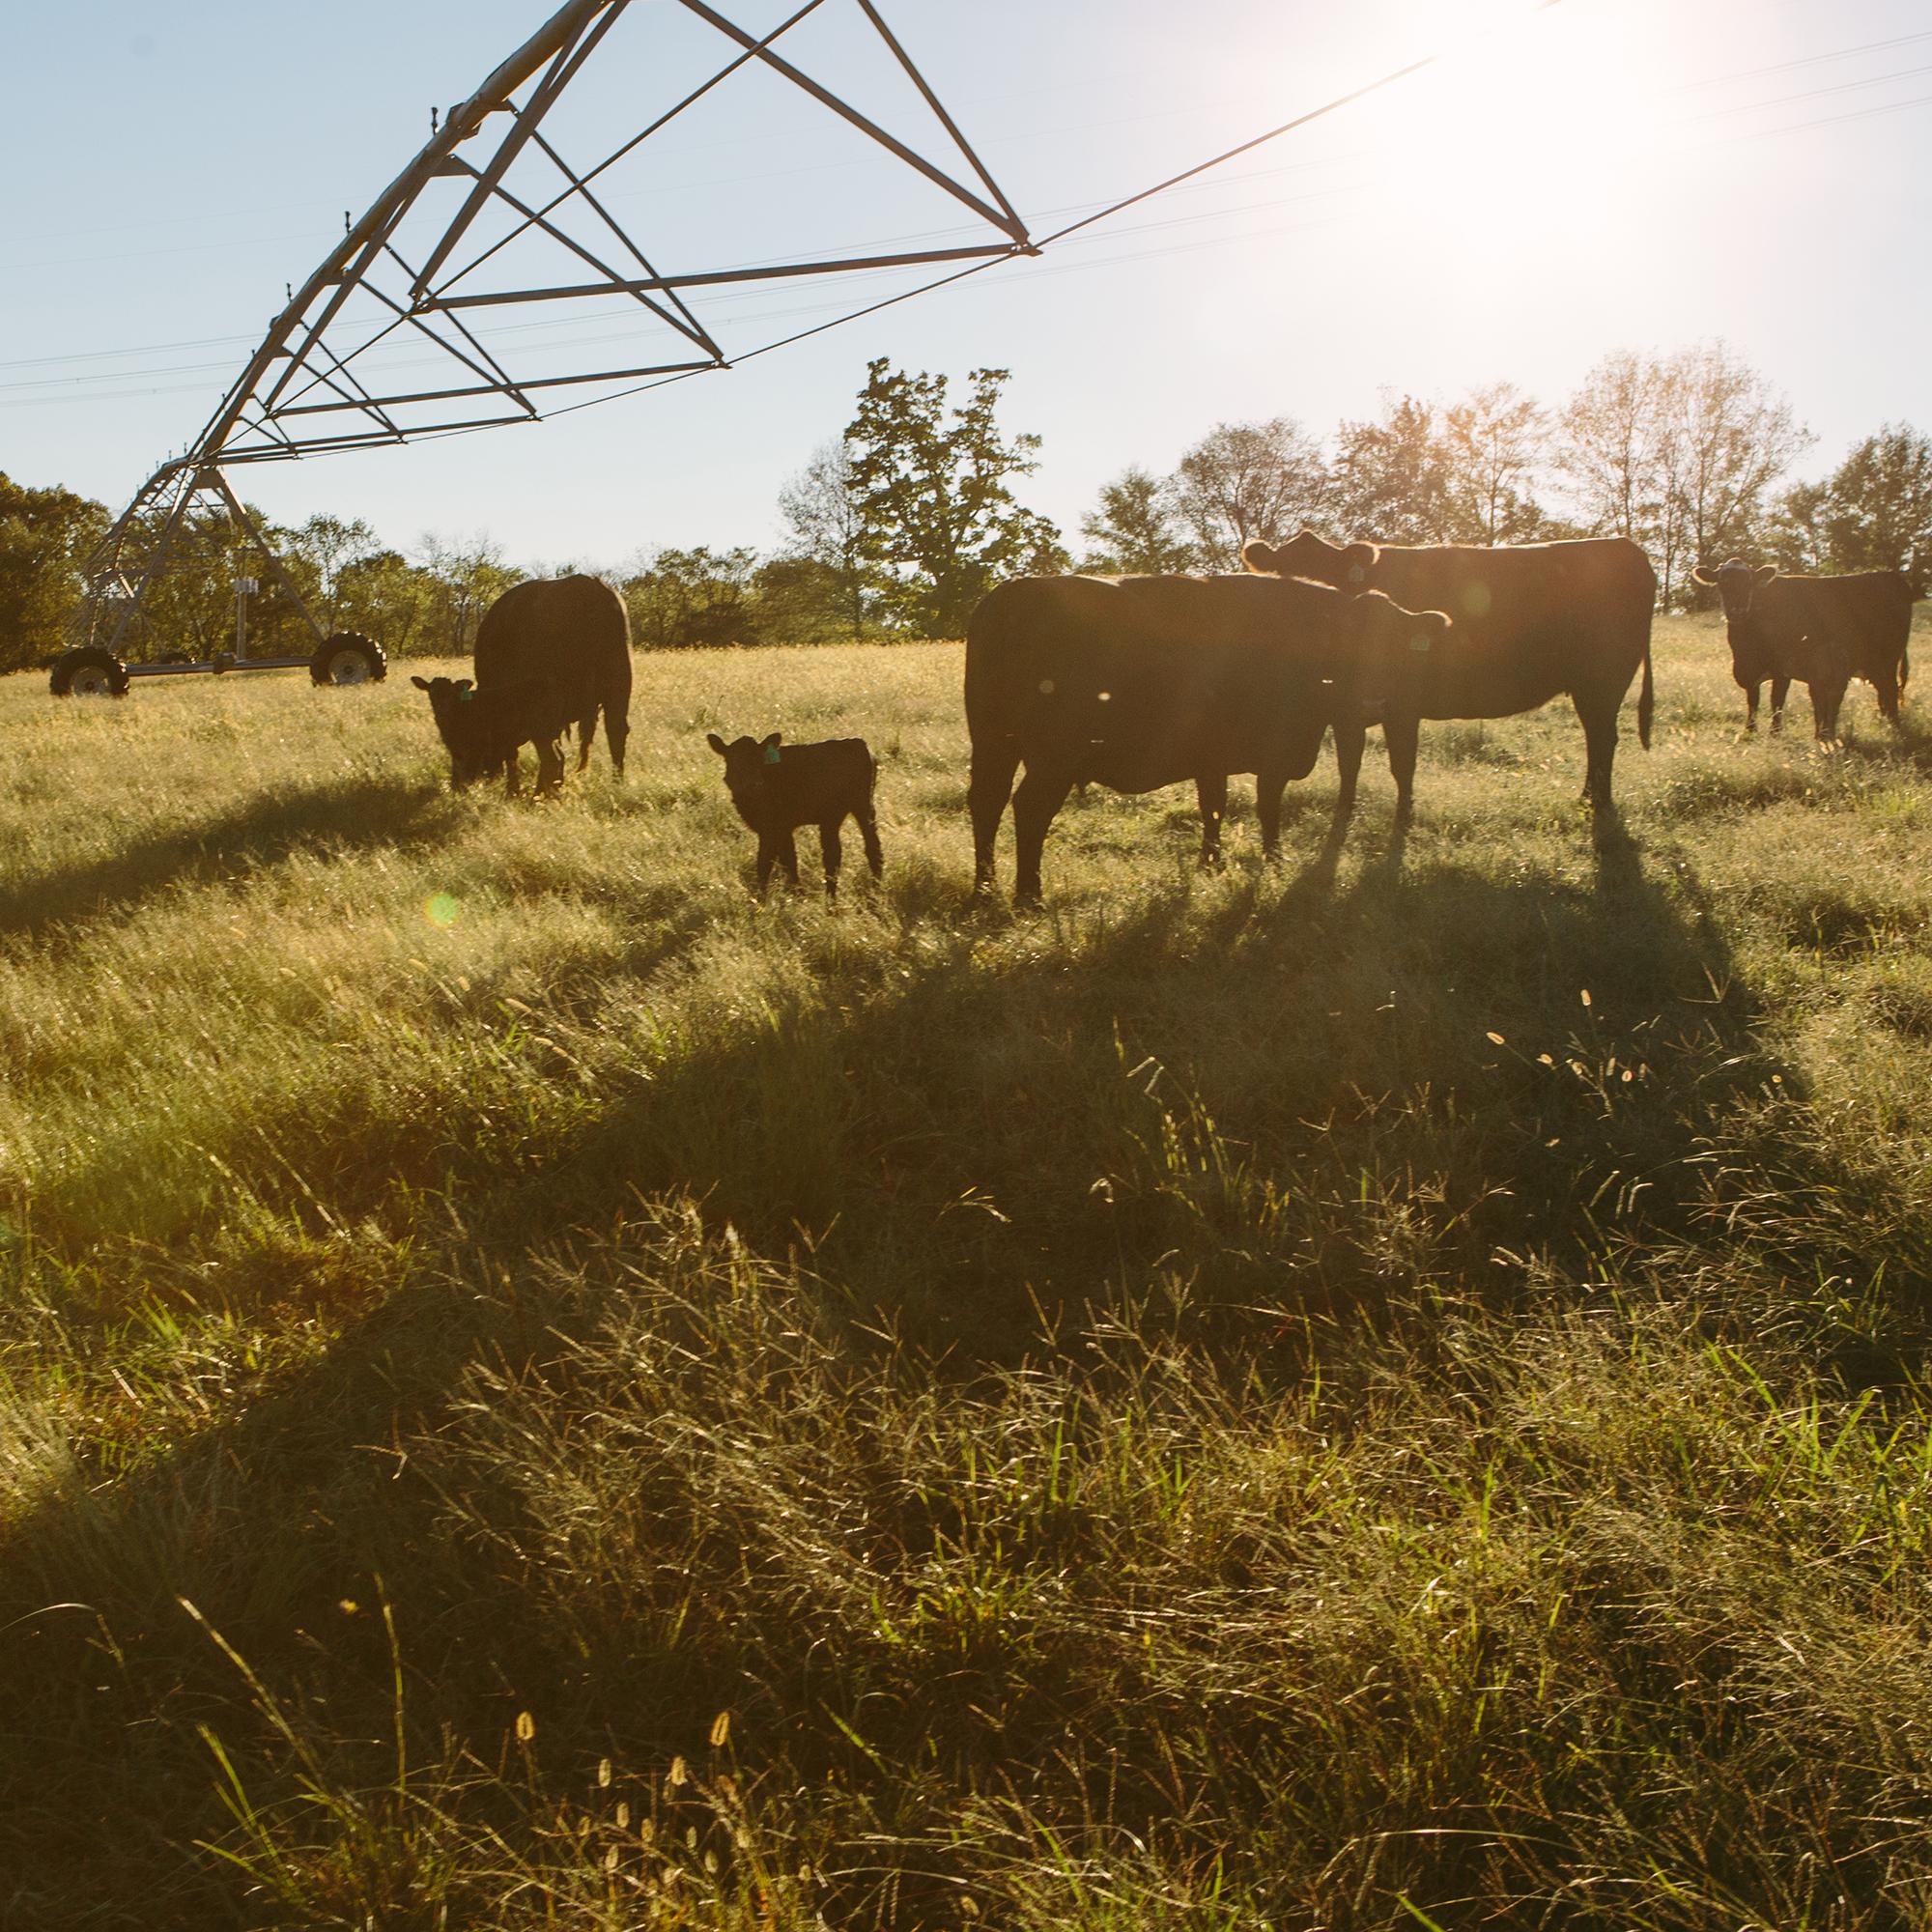 PASTURE RAISED - 100% pasture raised on all natural local forages